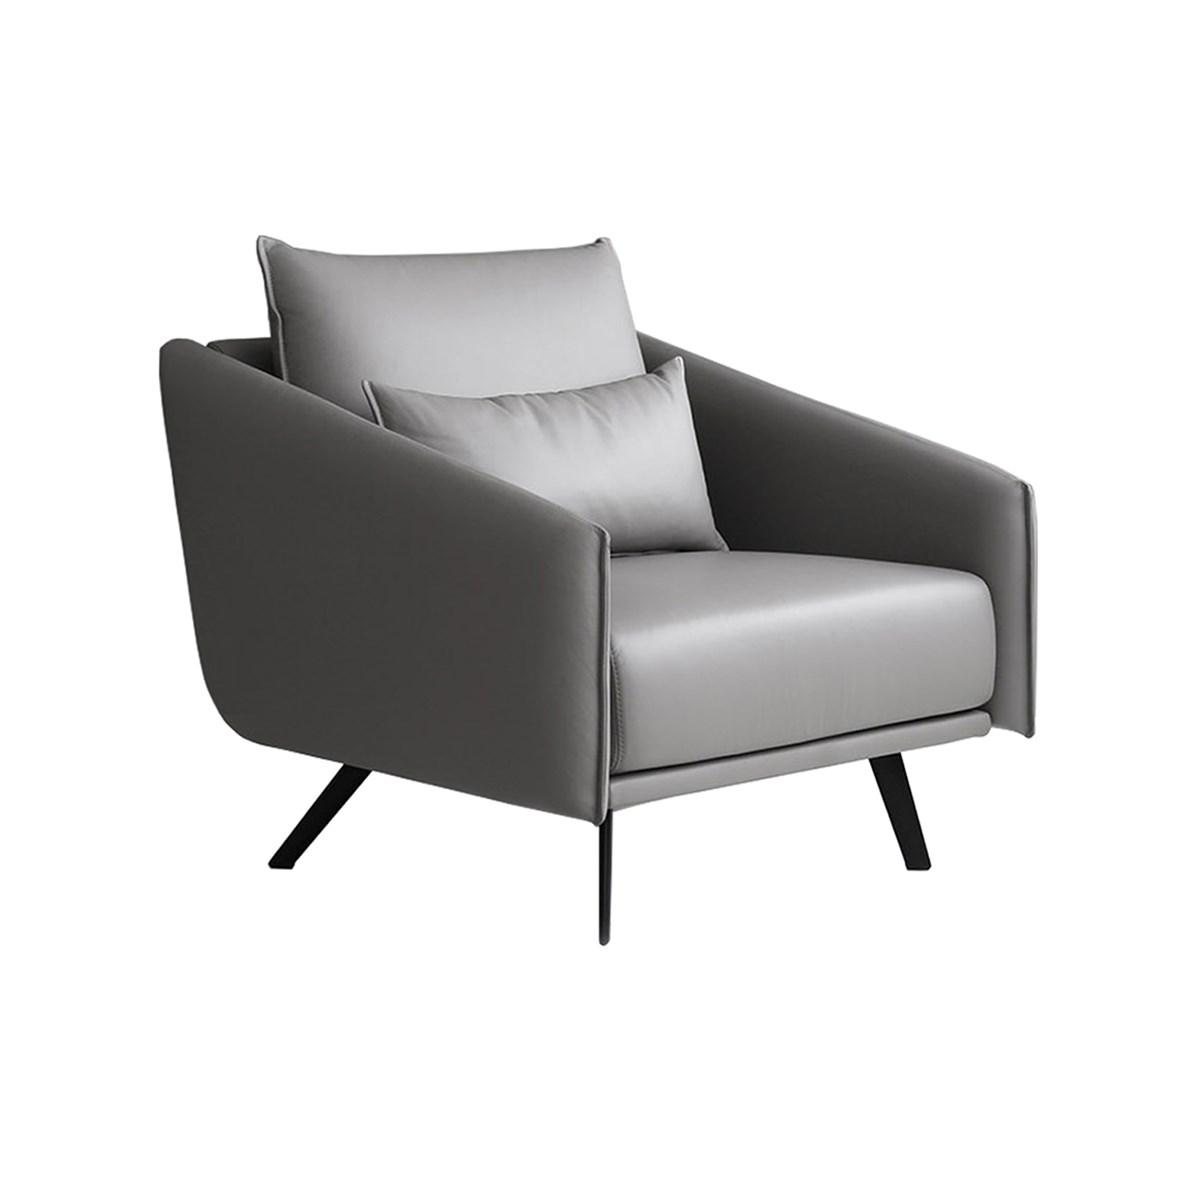 Stua-Jon-Gasca-Costura-Armchair-Matisse-1